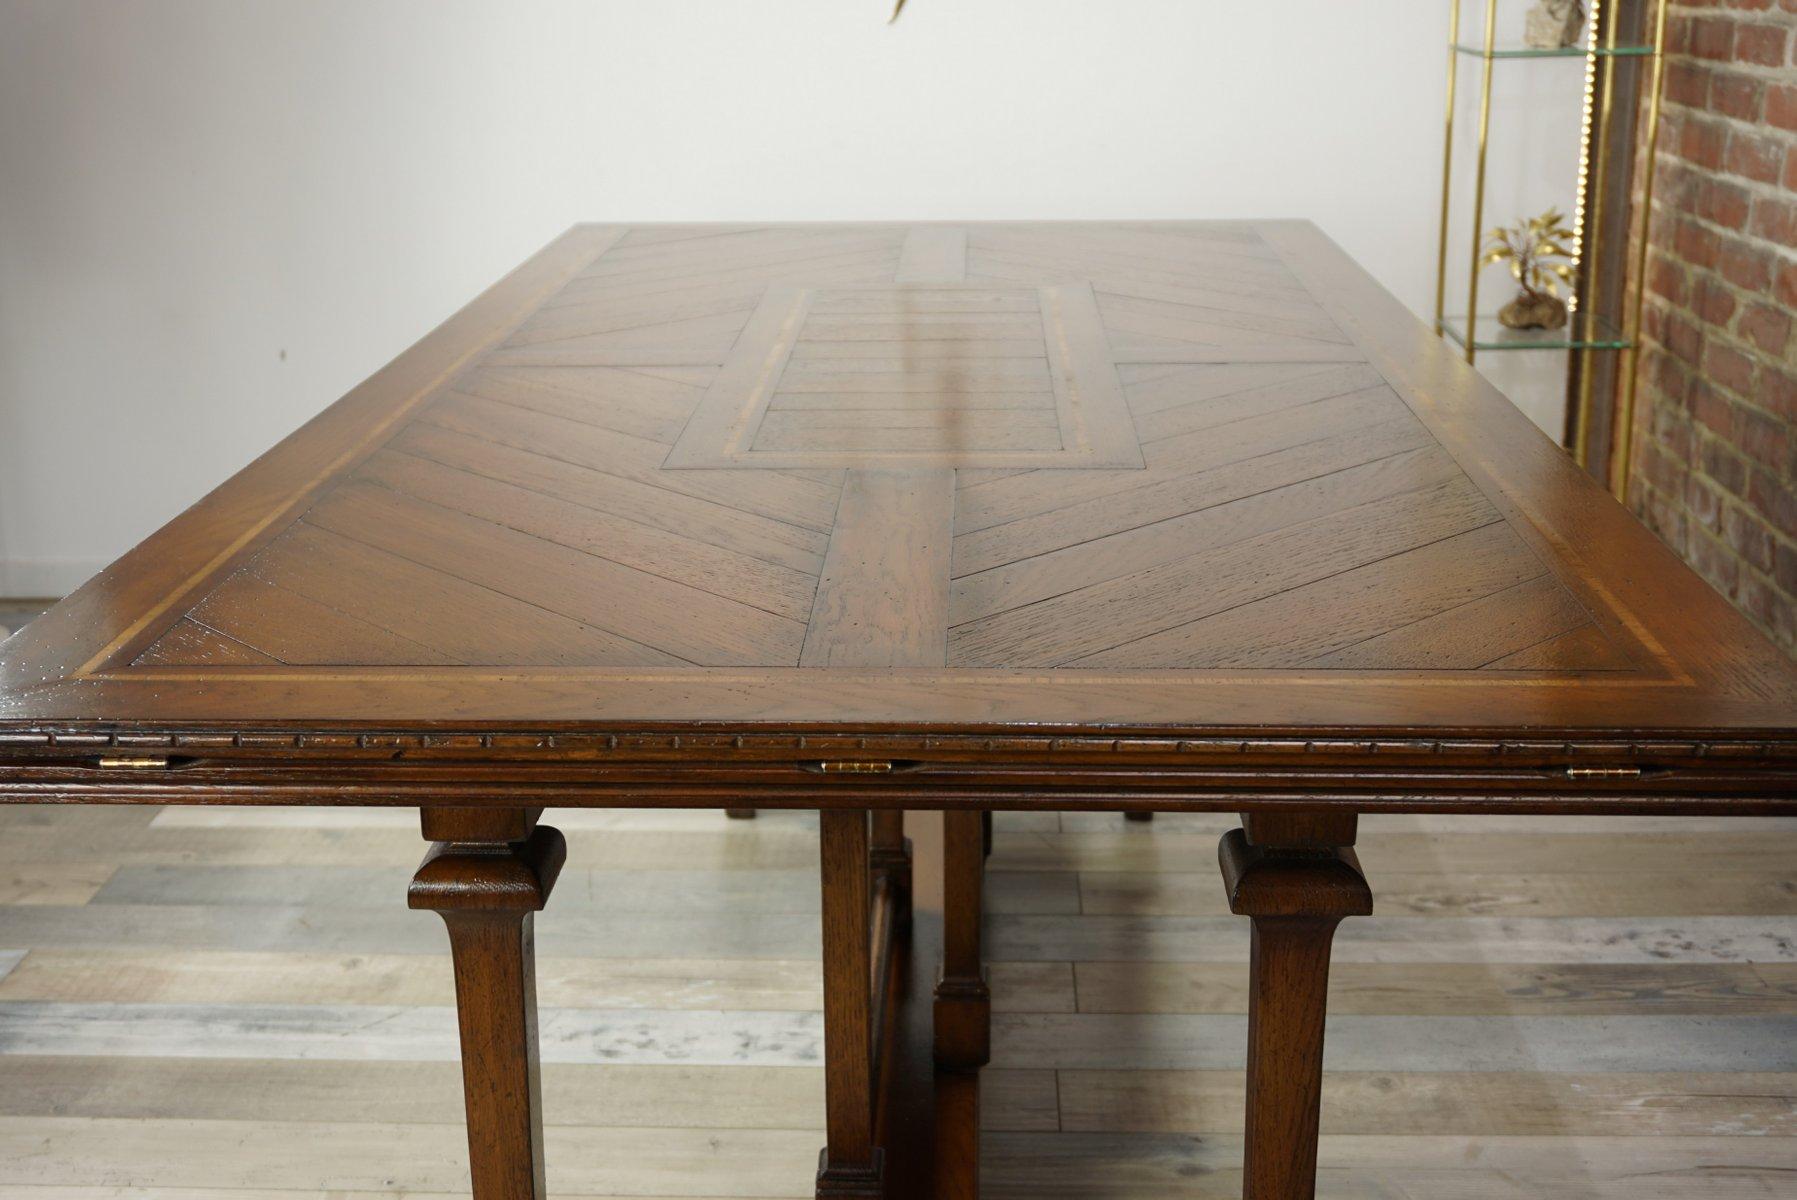 Table de salle manger vintage en bois 1940s en vente sur pamono for Table en bois de salle a manger